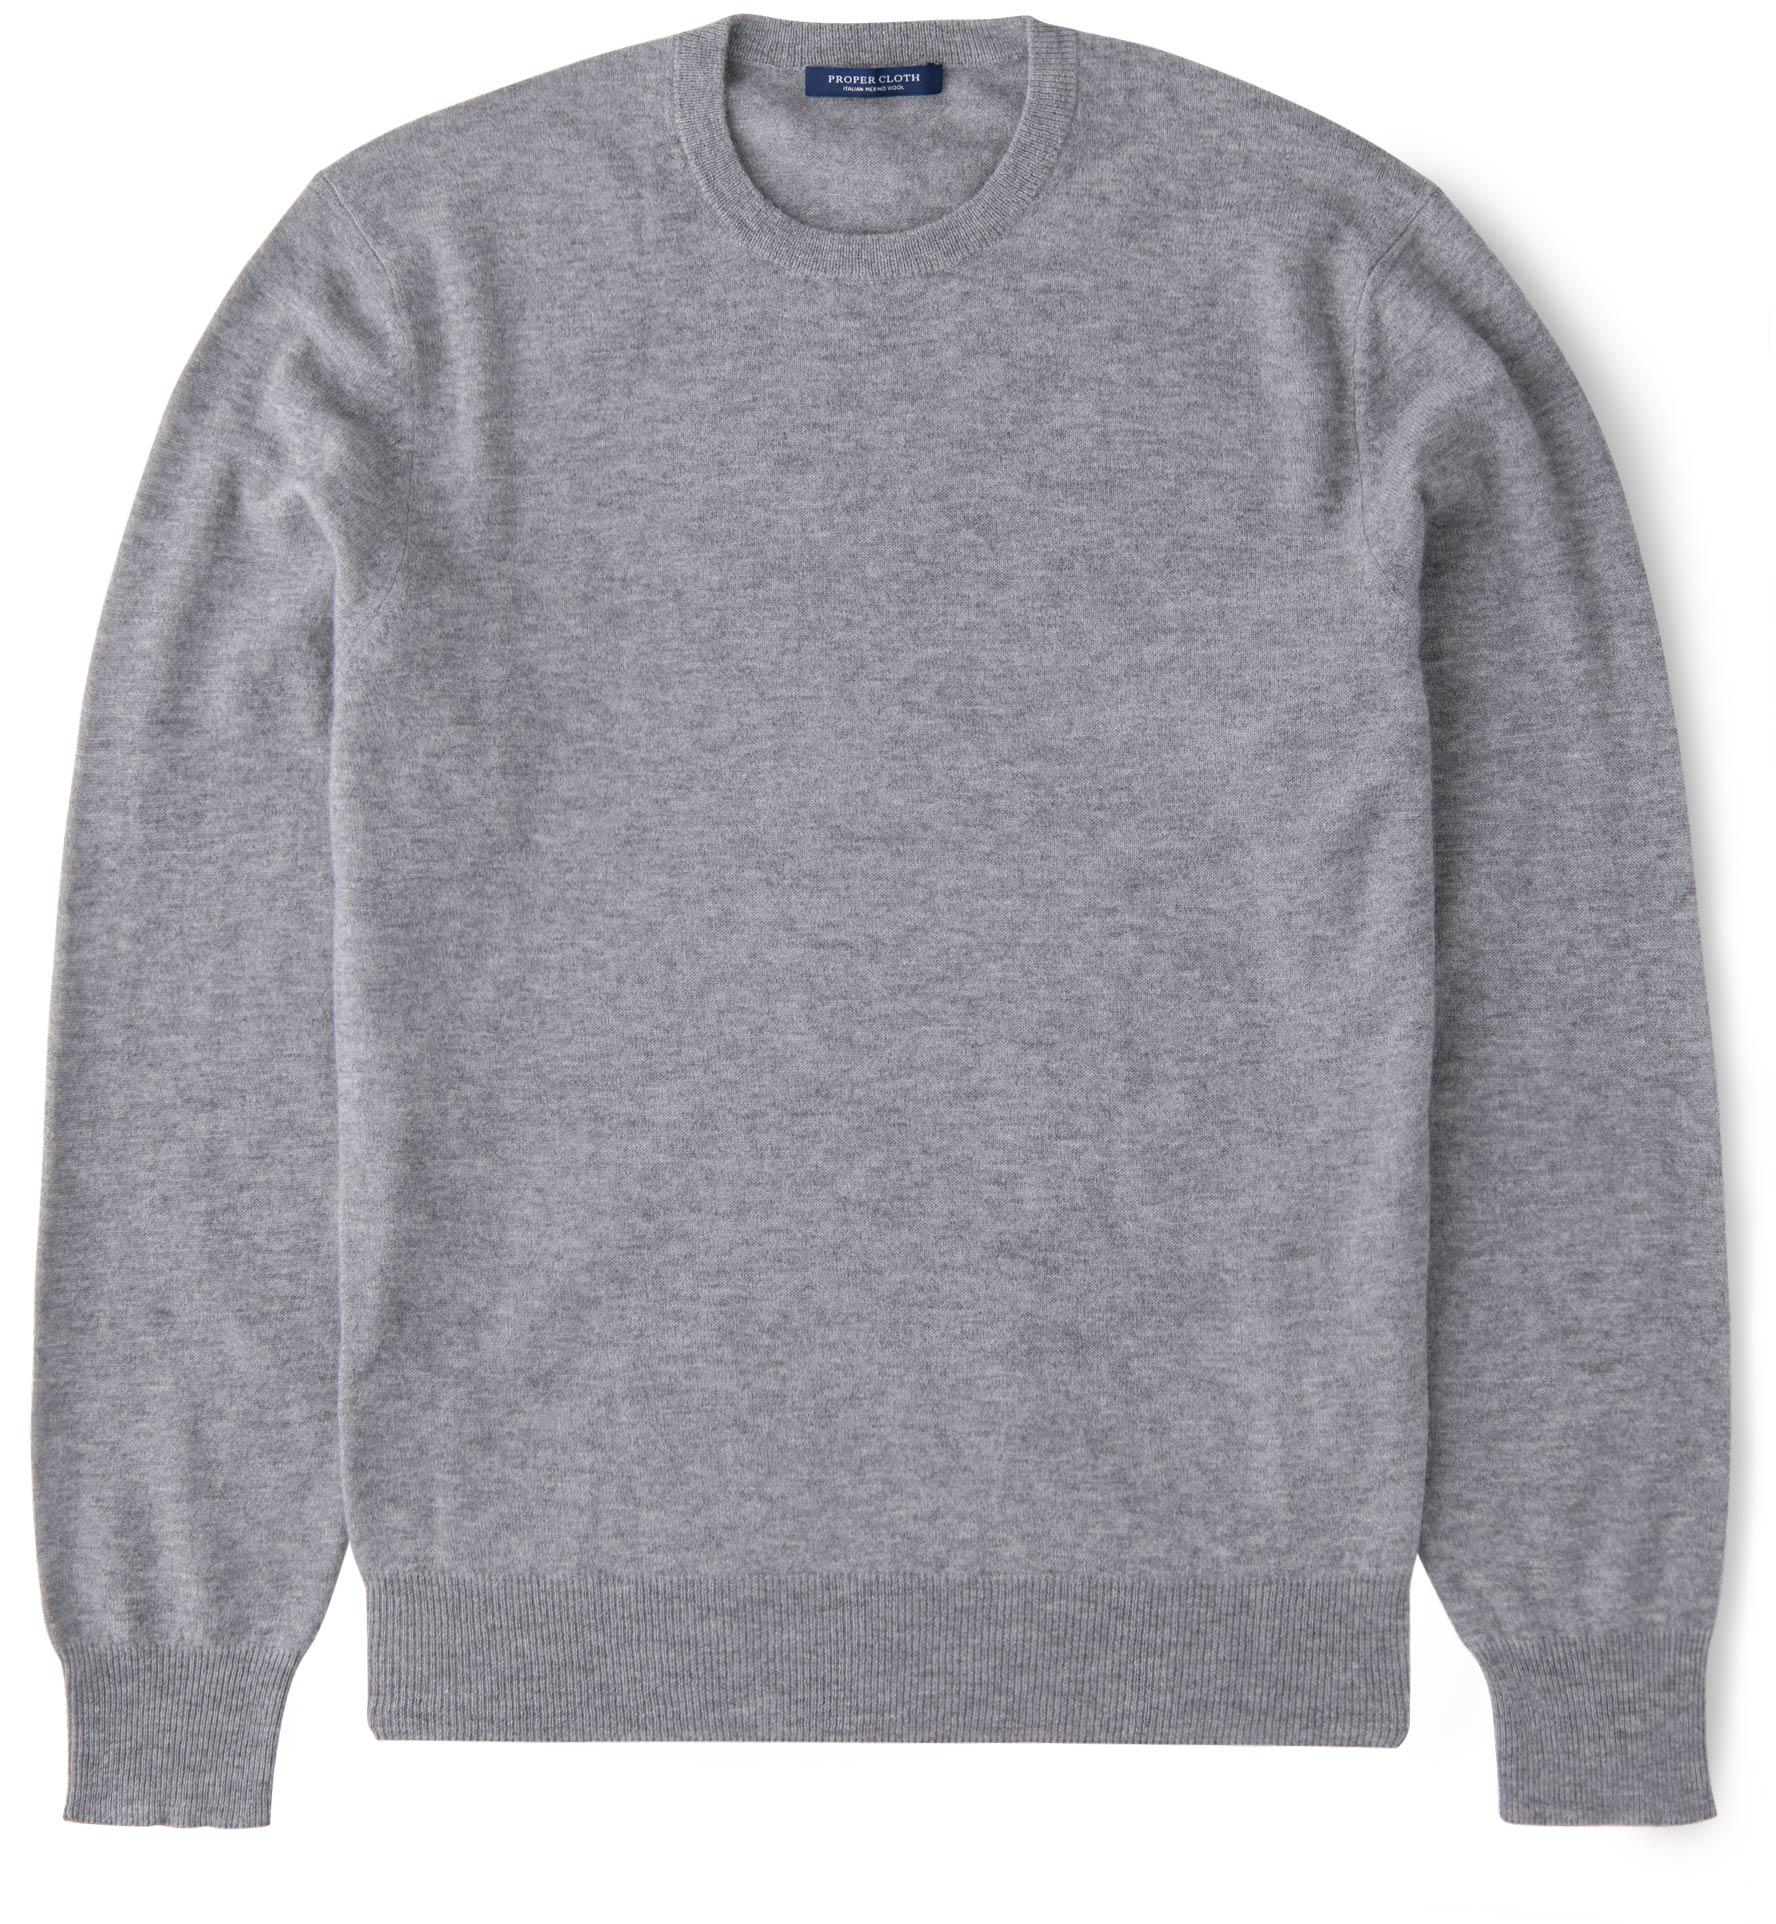 Zoom Image of Light Grey Melange Merino Crewneck Sweater